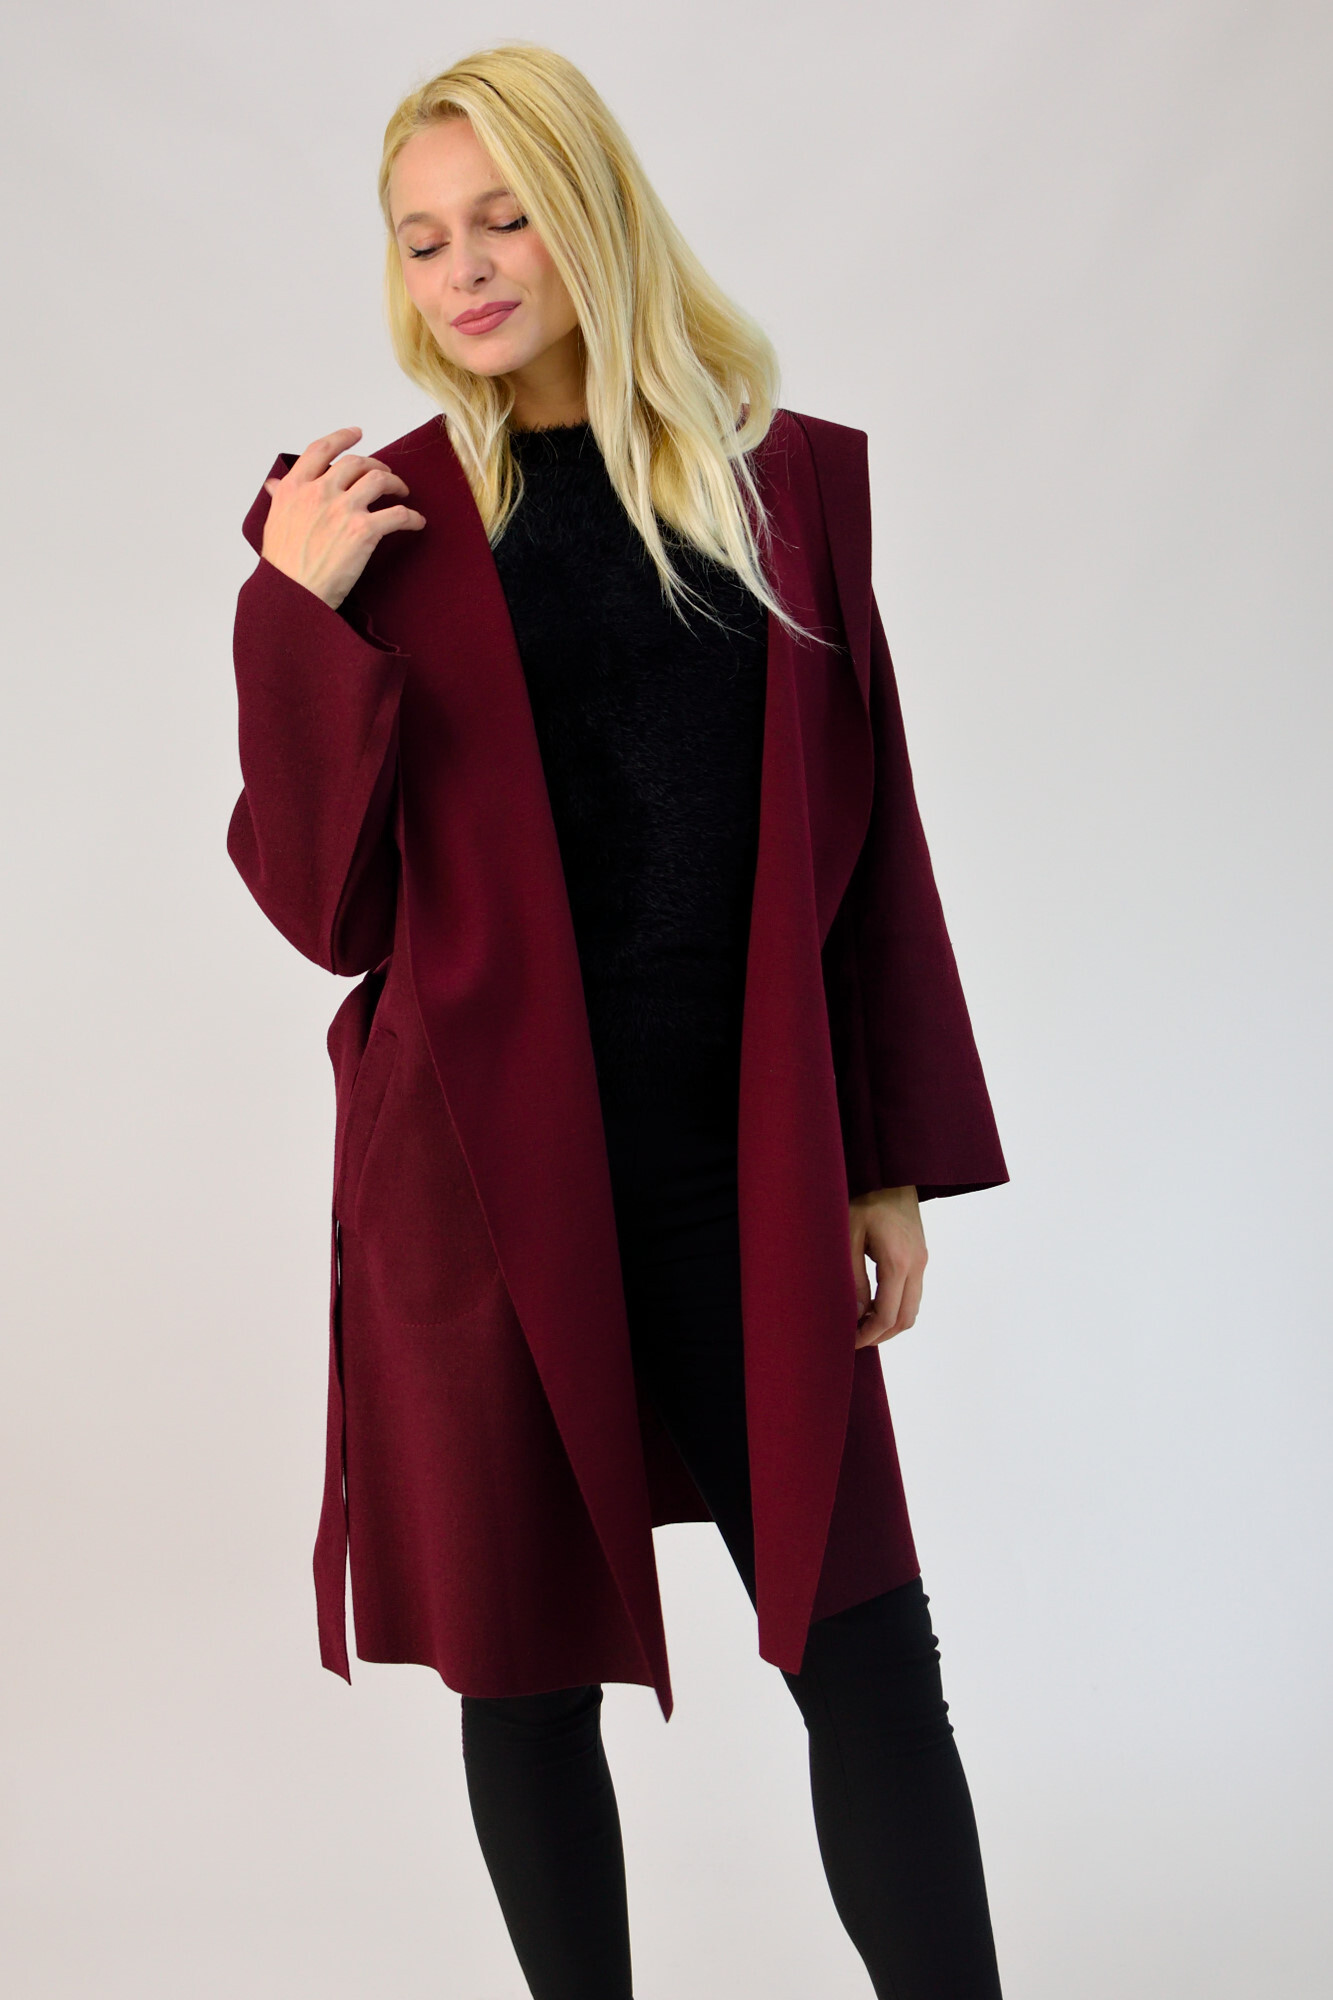 993da3a95aab Γυναικείο παλτό με ζώνη και κουκούλα